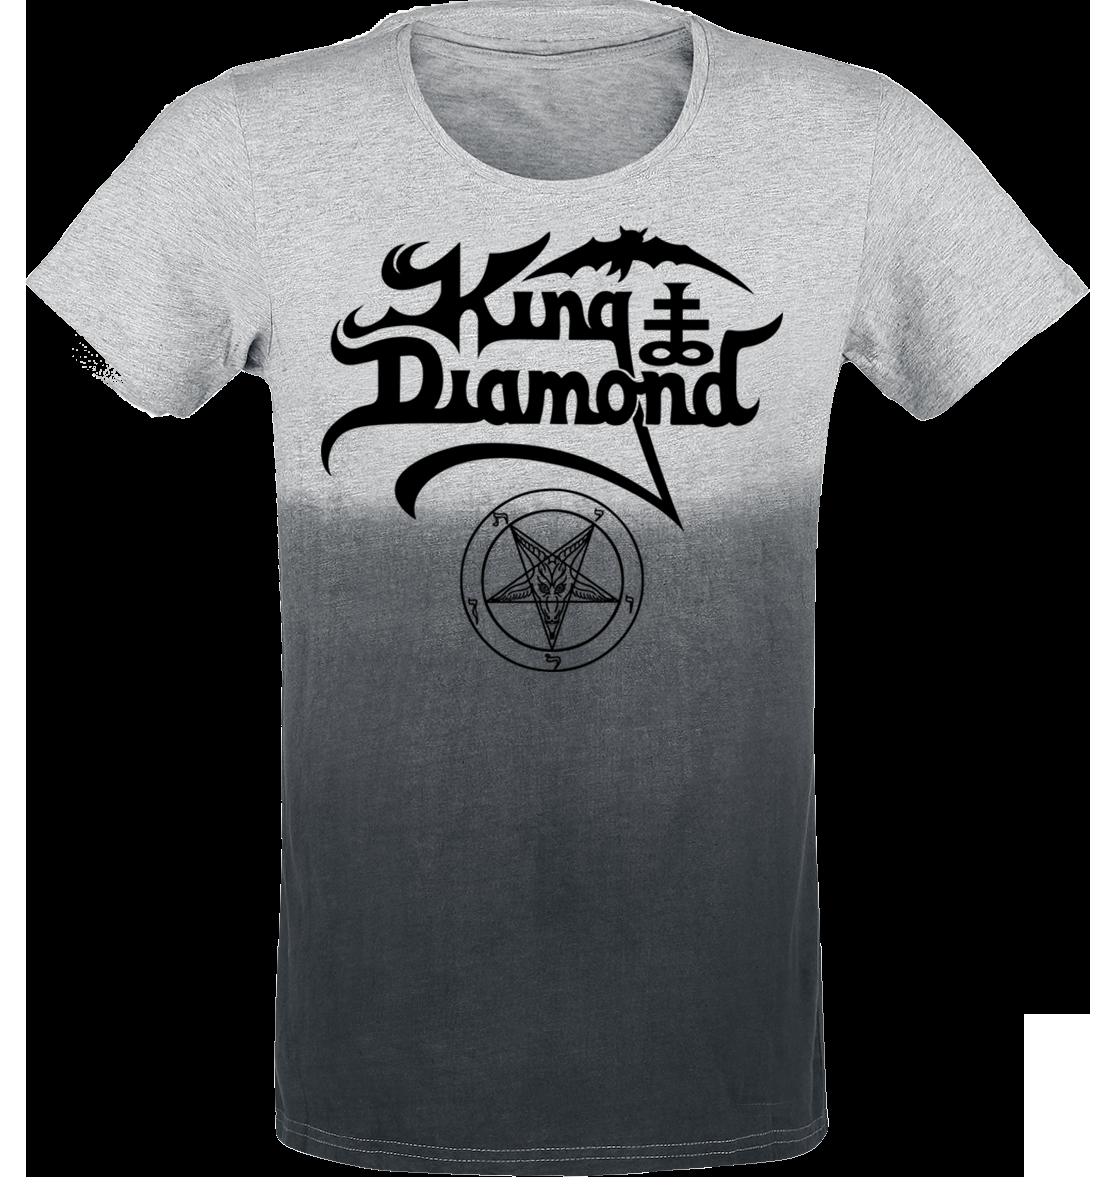 King Diamond - Logo - T-Shirt - light greying/greying image